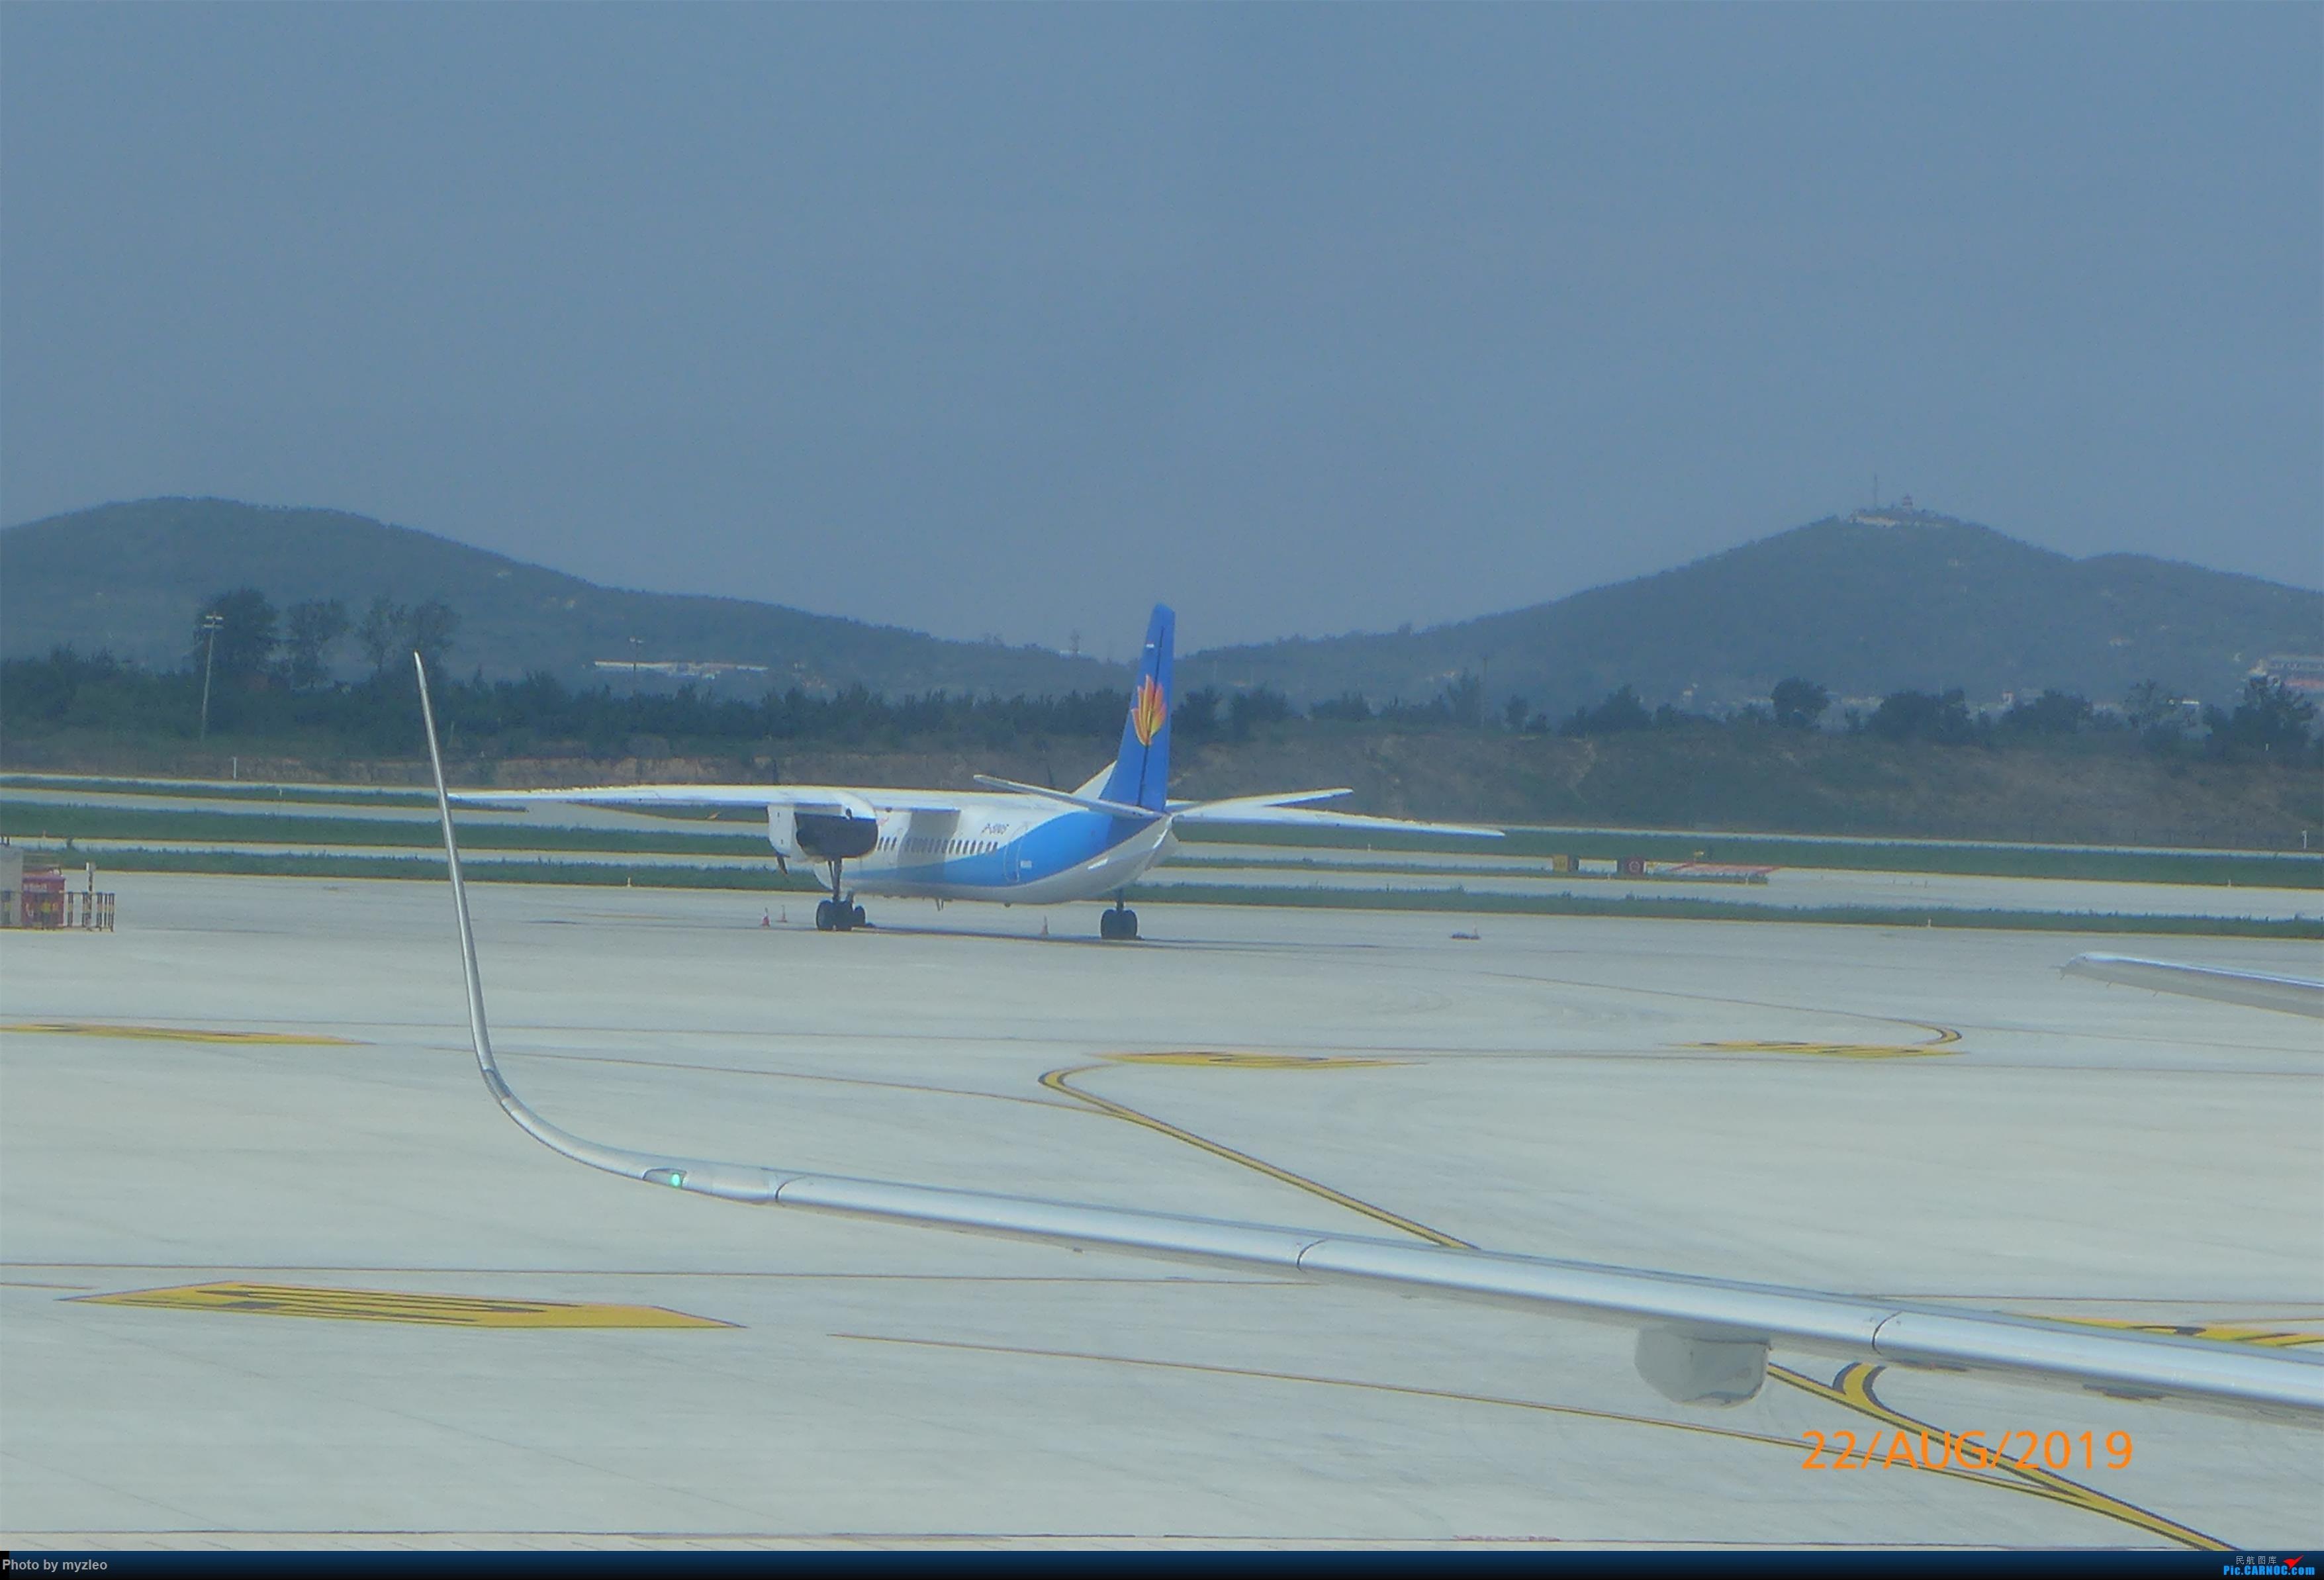 Re:【myzleo的游记5.2】梦圆一九(2)首访南苑把梦圆,初搭巴航连新缘 XIAN AIRCRAFT MA 60 B-3705 中国烟台蓬莱国际机场